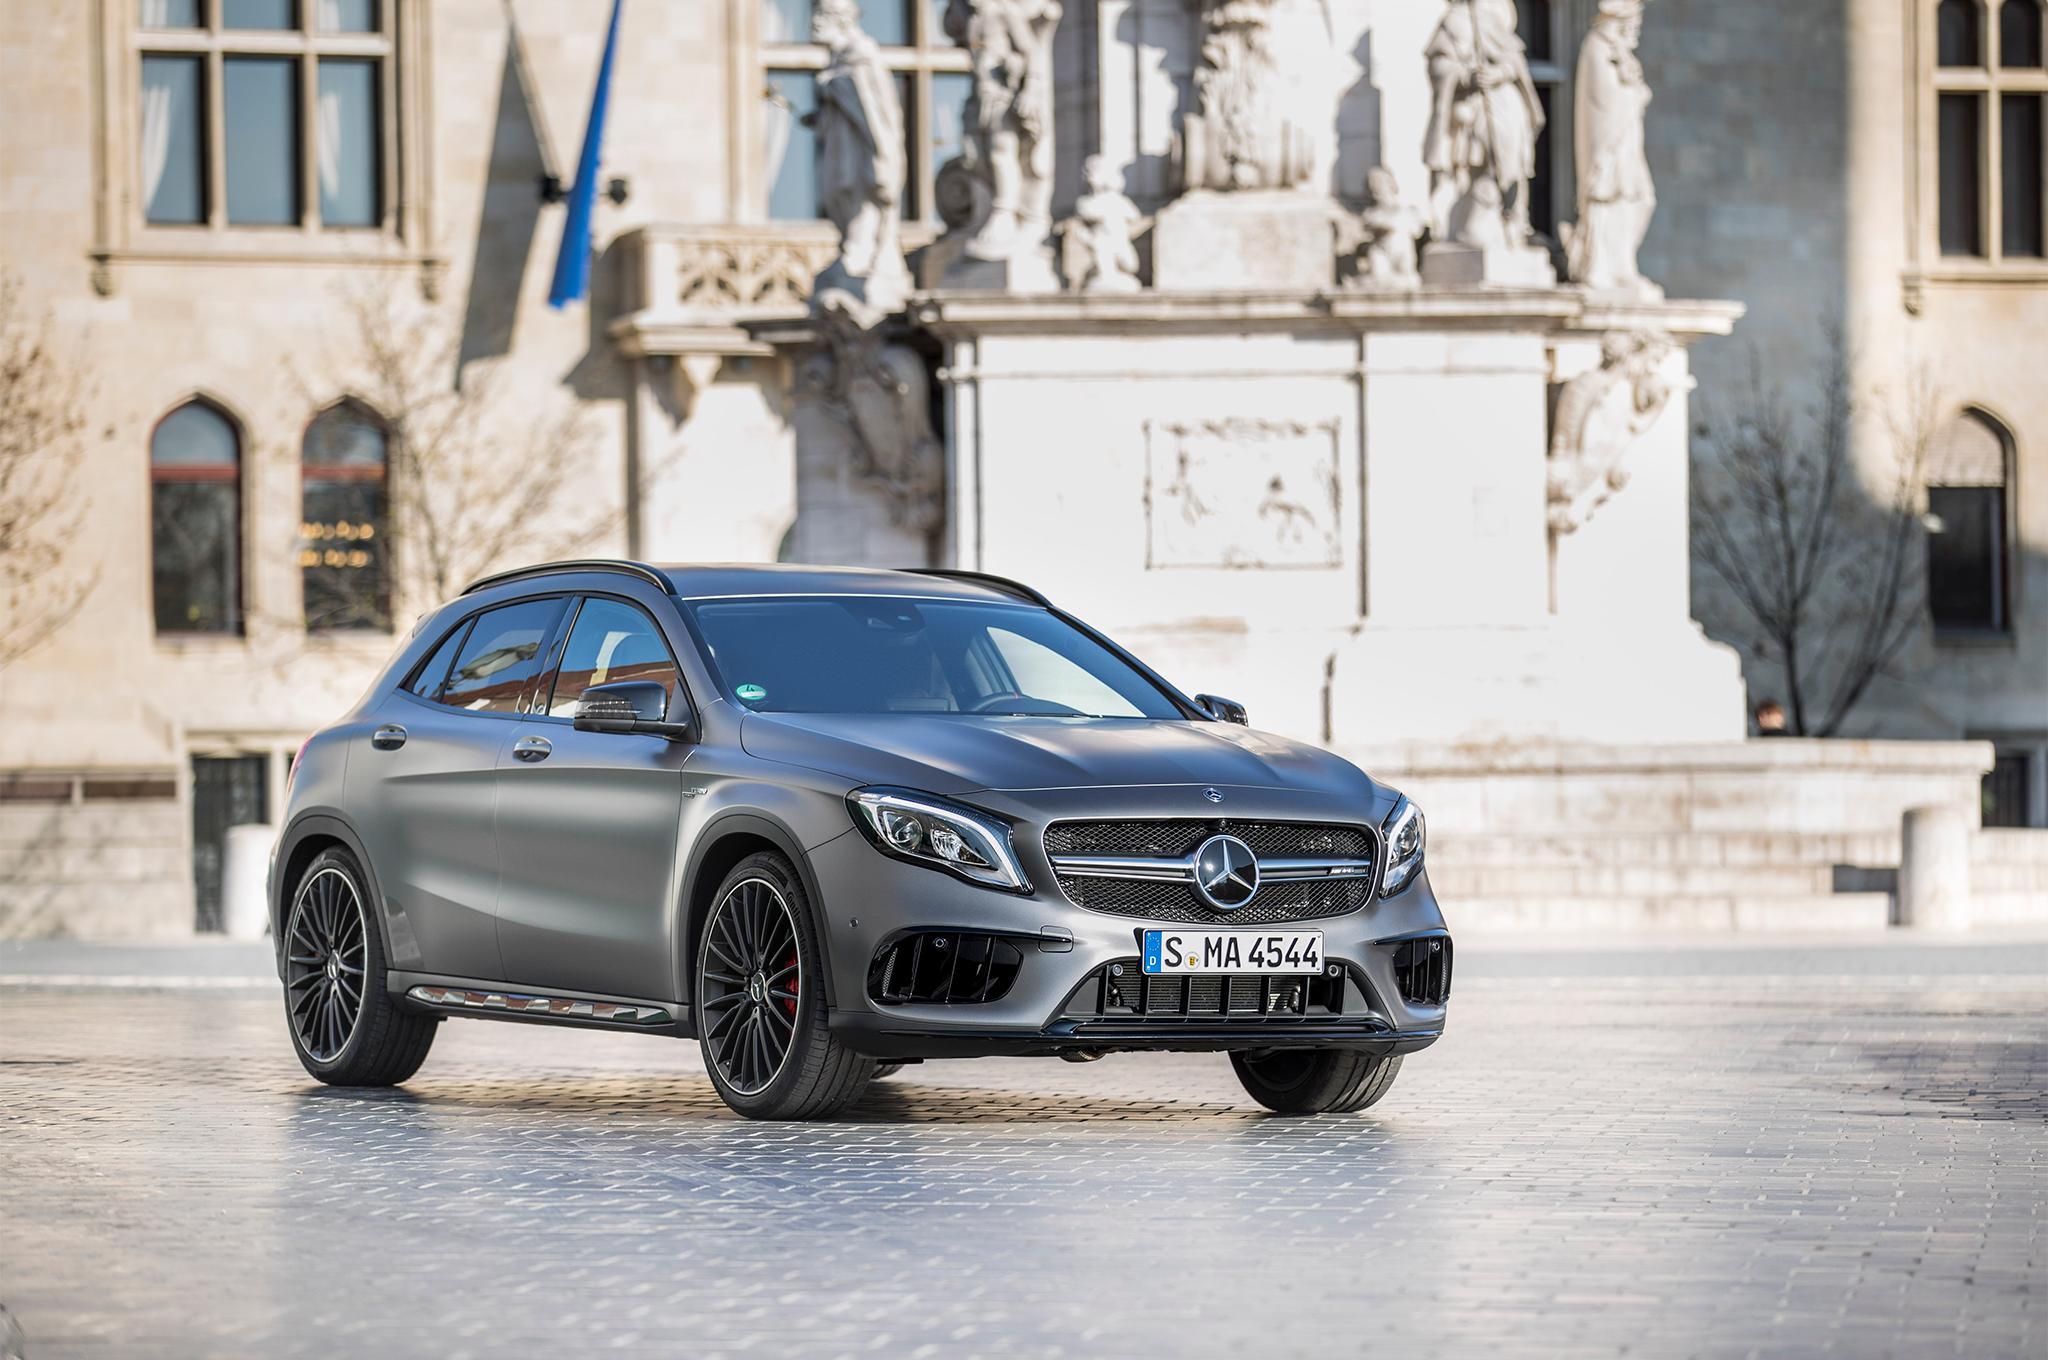 2018-Mercedes-AMG-GLA45-4MATIC-front-three-quarter-09